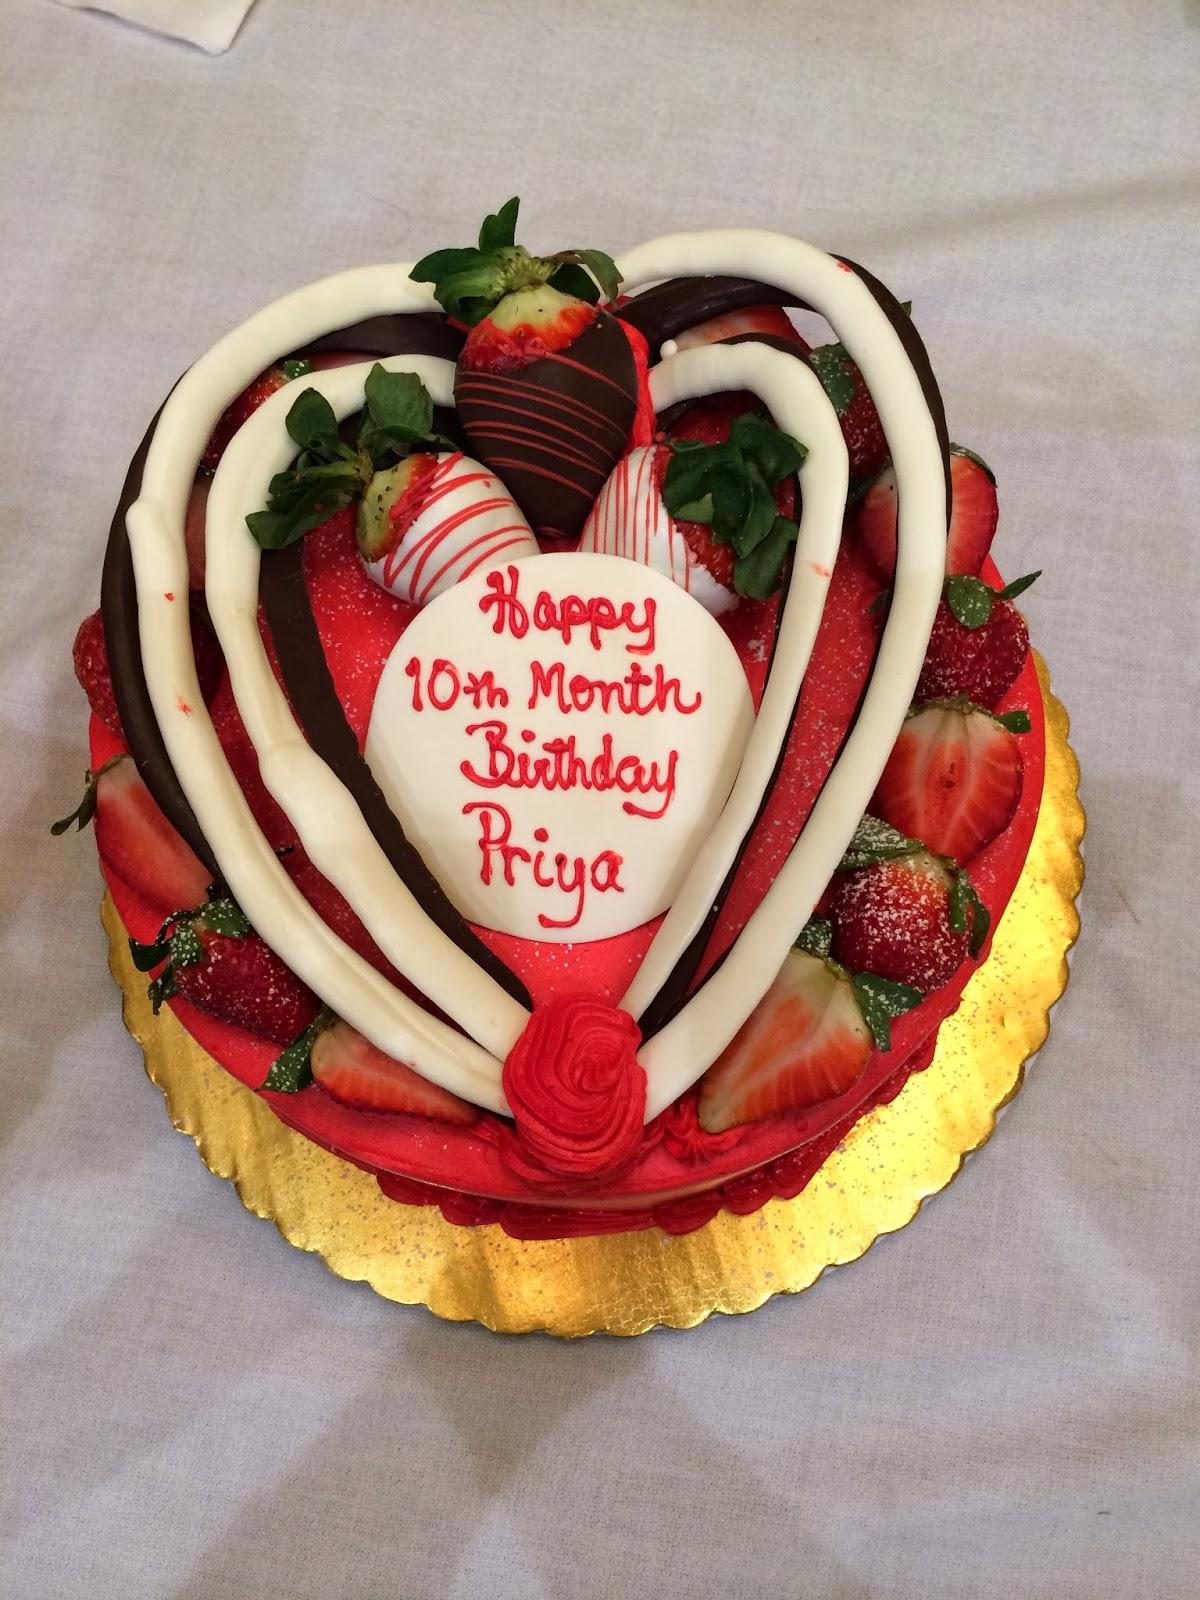 Cake Images For Priya : Vijay Madala, My Story: Priya 10th Month Pictures